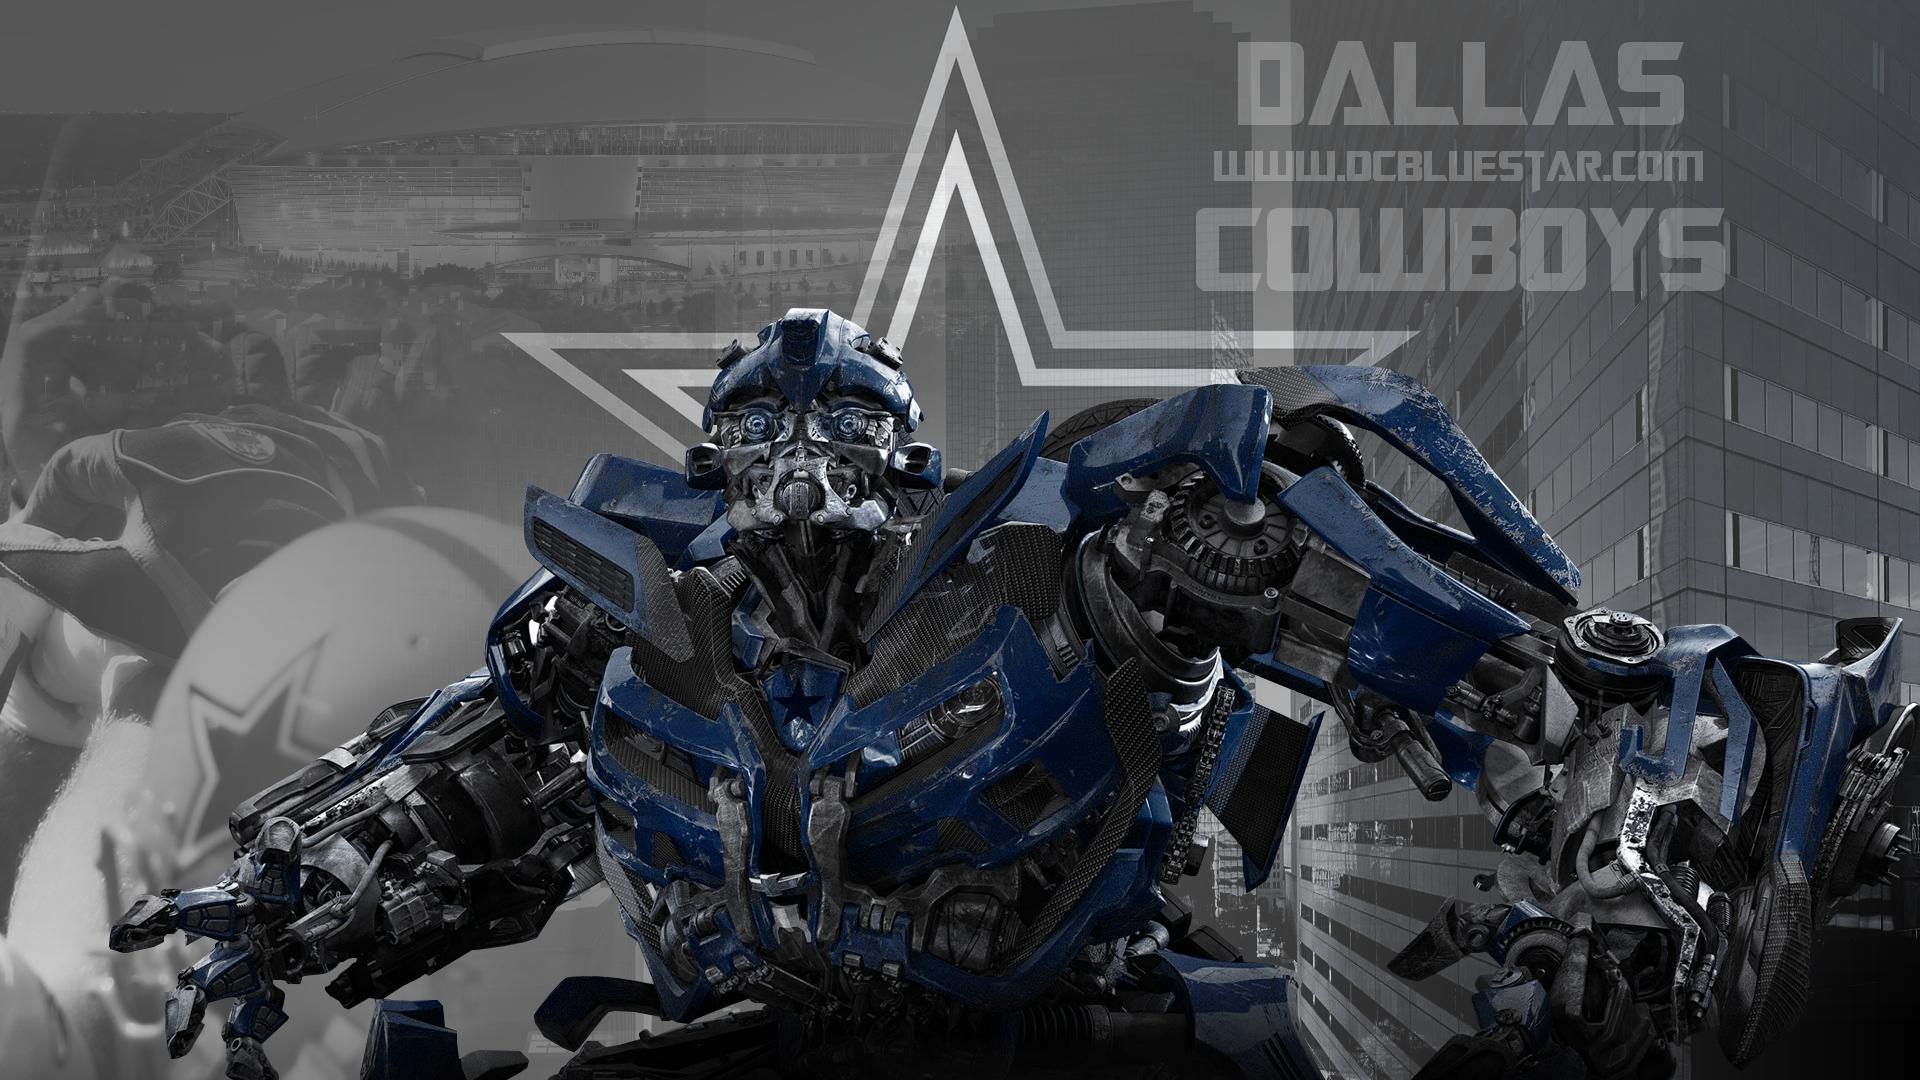 Free Download Dallas Cowboys Wallpapers Computers Wallpaperjpg